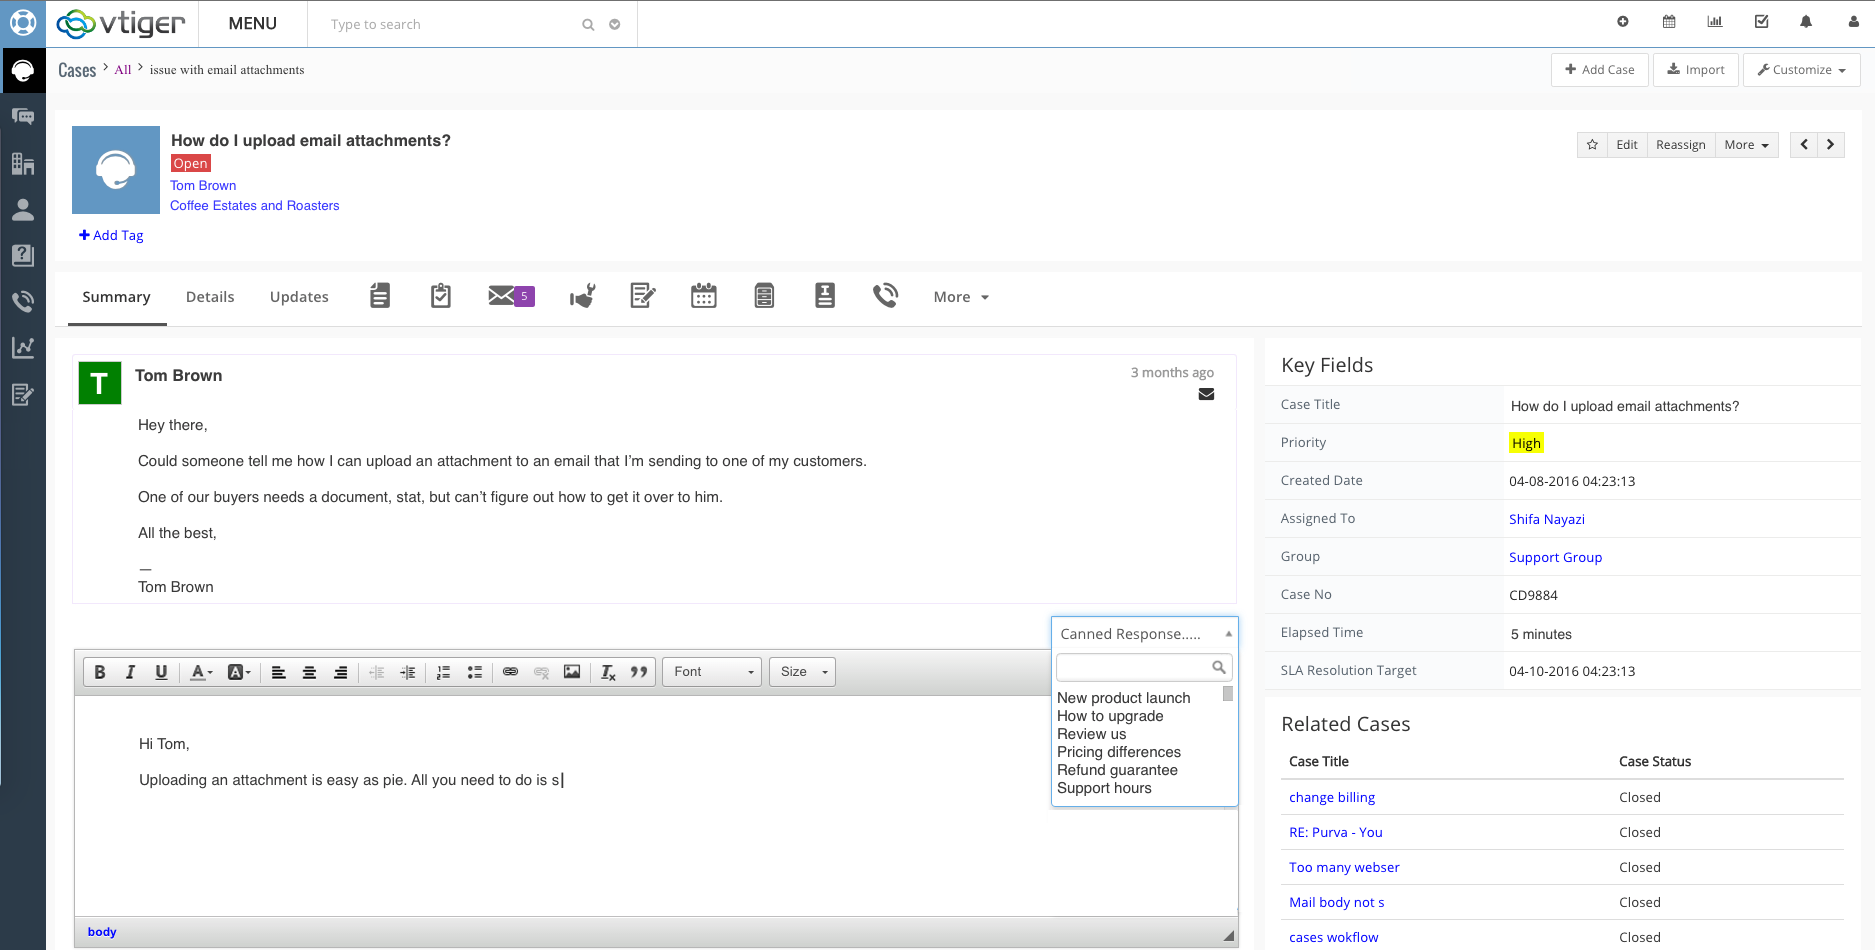 helpdesk customer relationship management